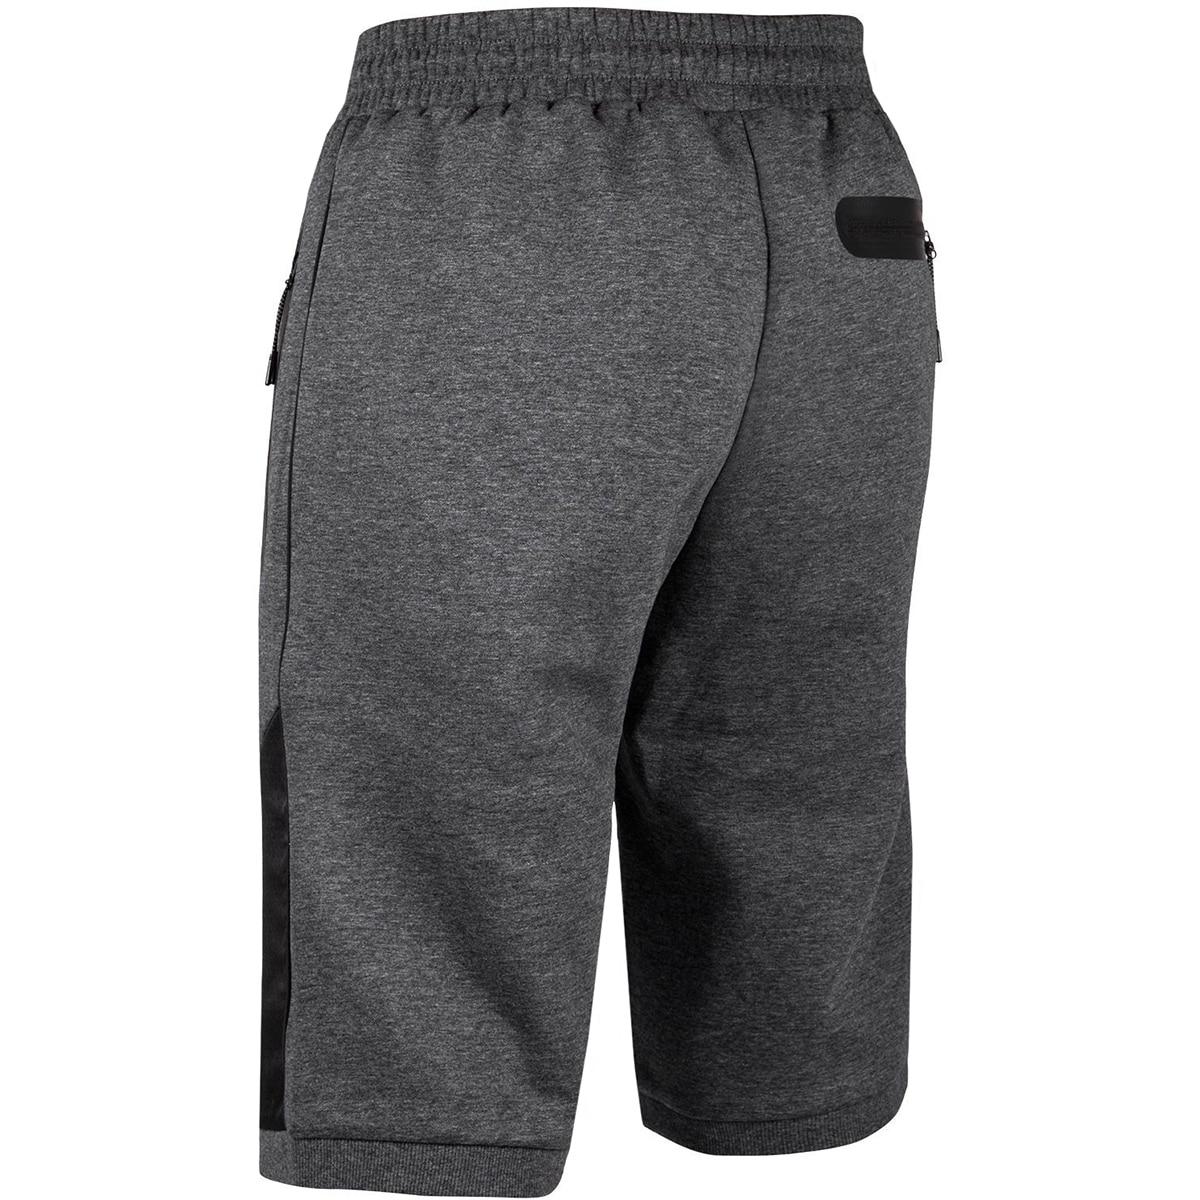 c7797fad71b592 Shop Venum Laser Drawstring Waist Cotton Shorts - Dark Camo - Free Shipping  Today - Overstock - 22530098 - Dark Camo - XL